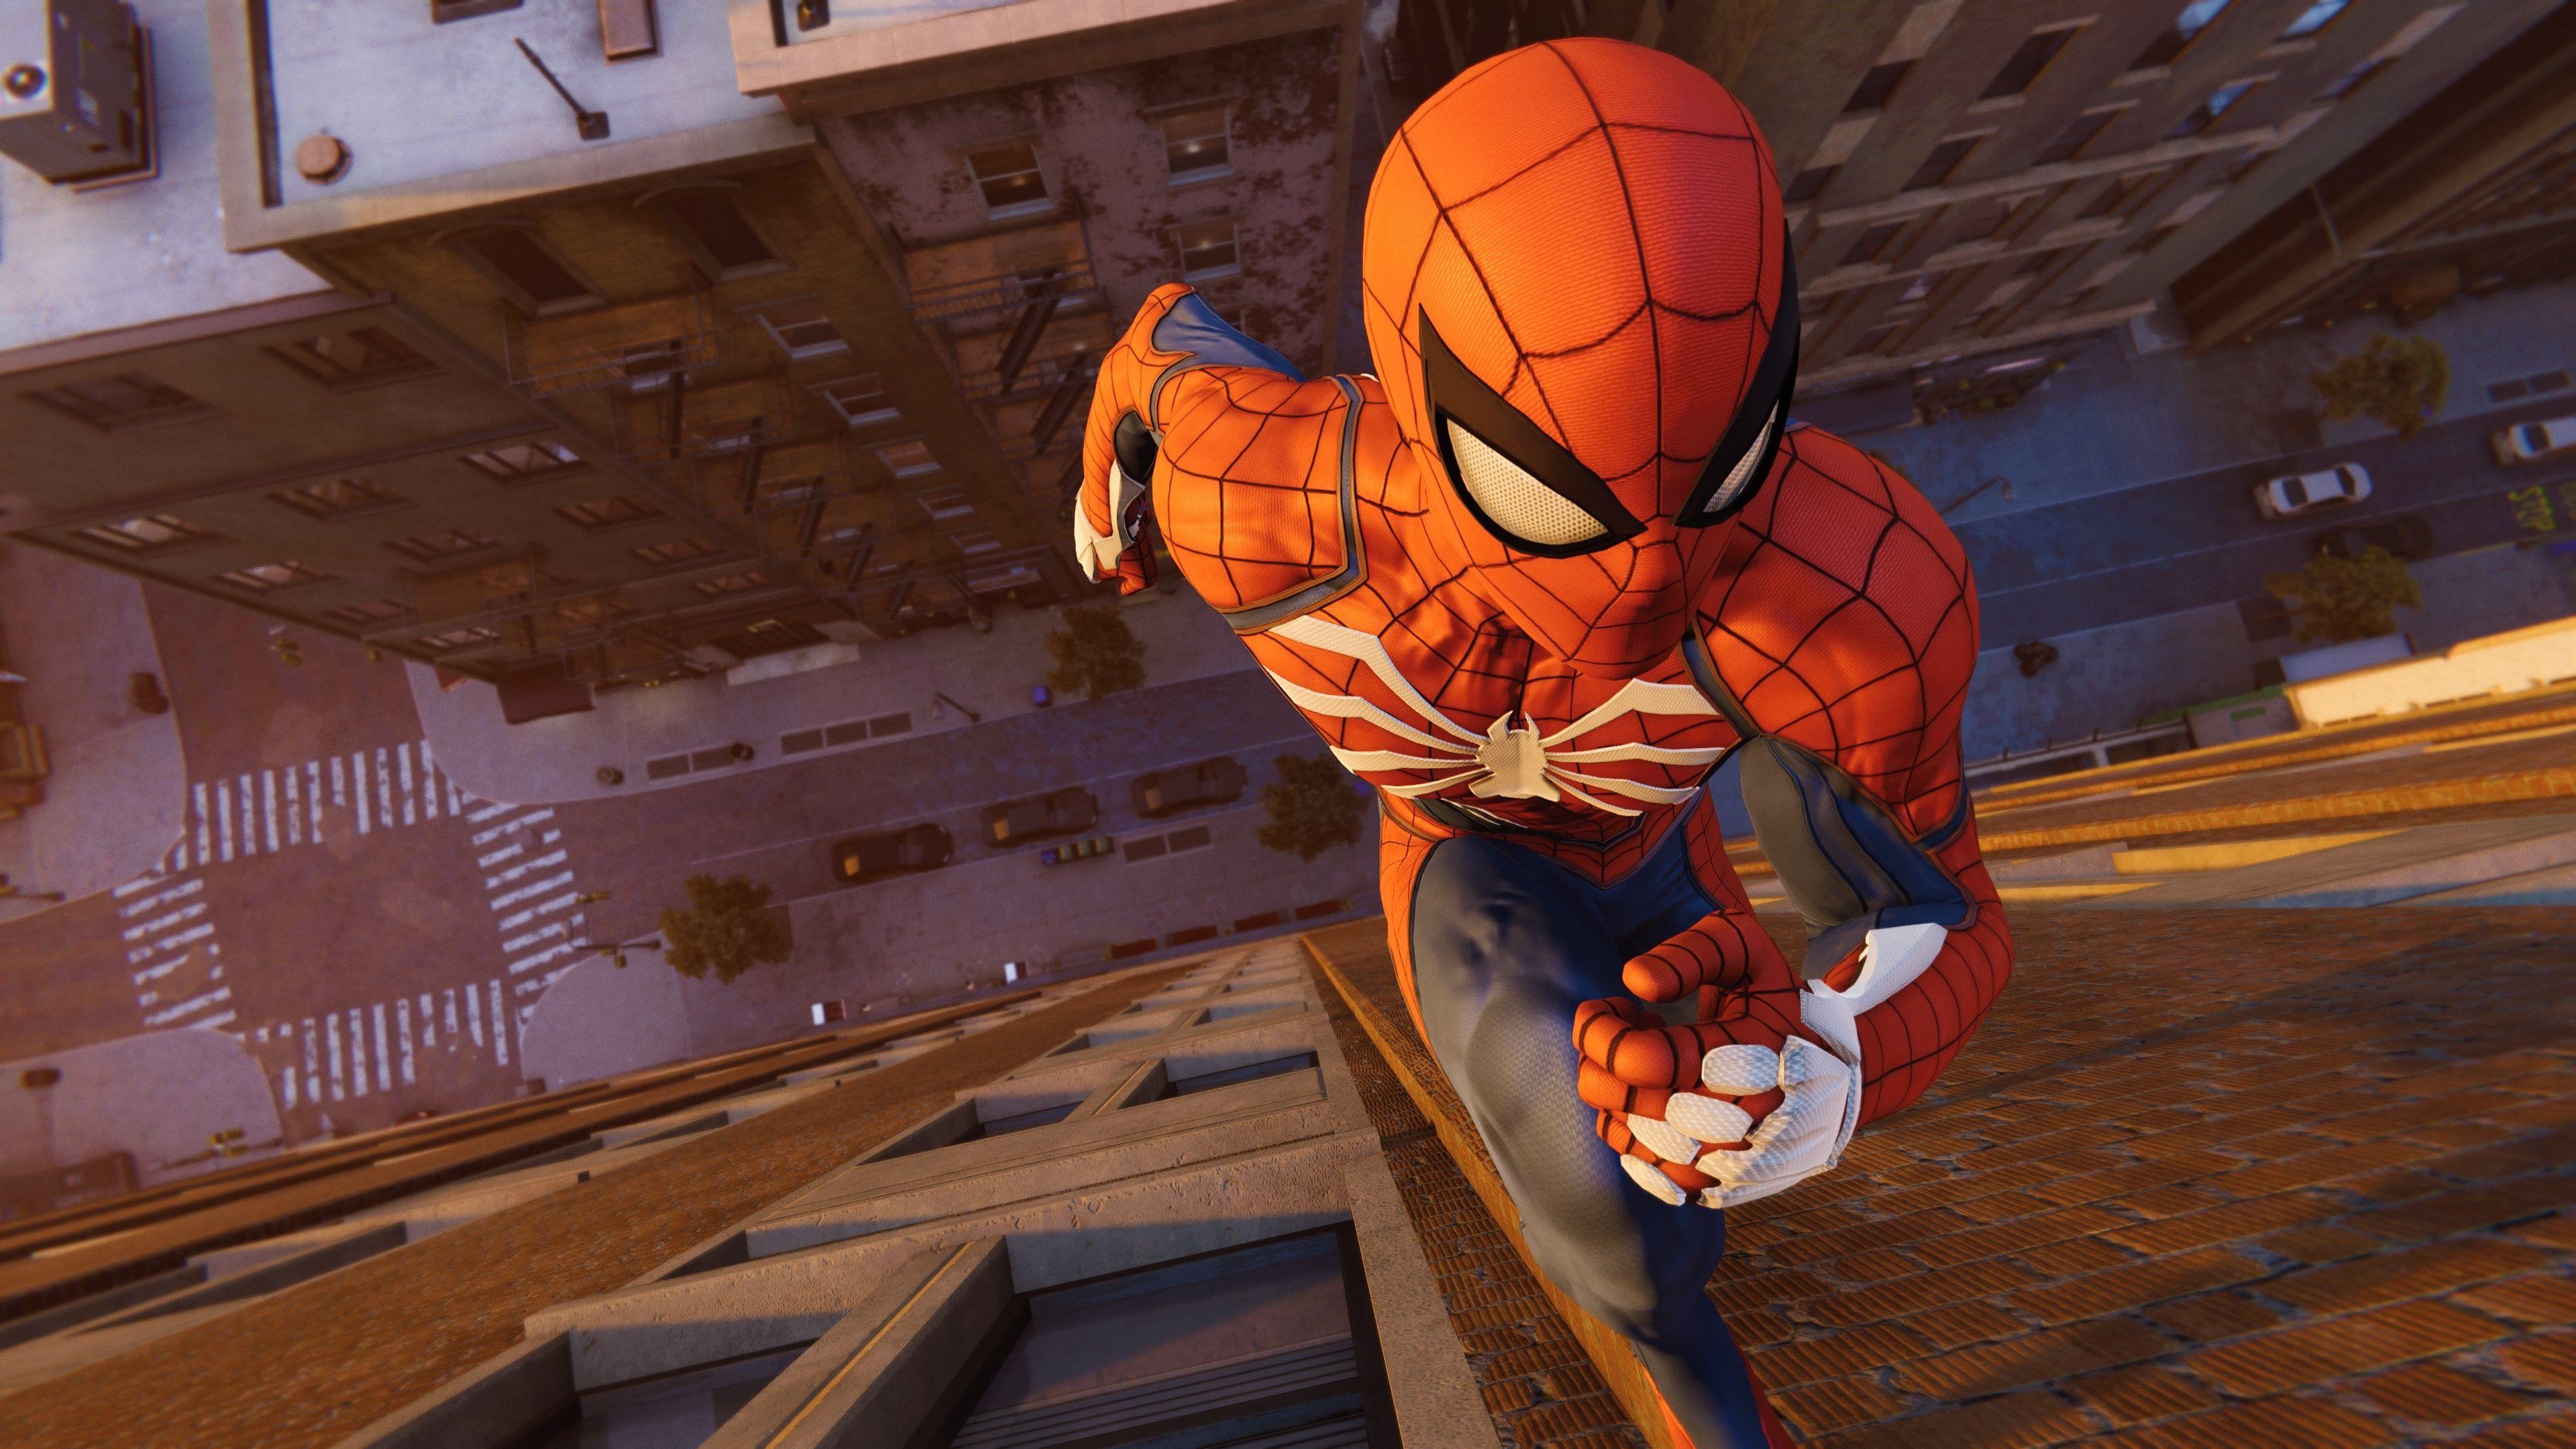 Wallpapers open world, Insomniac Games, spiderman